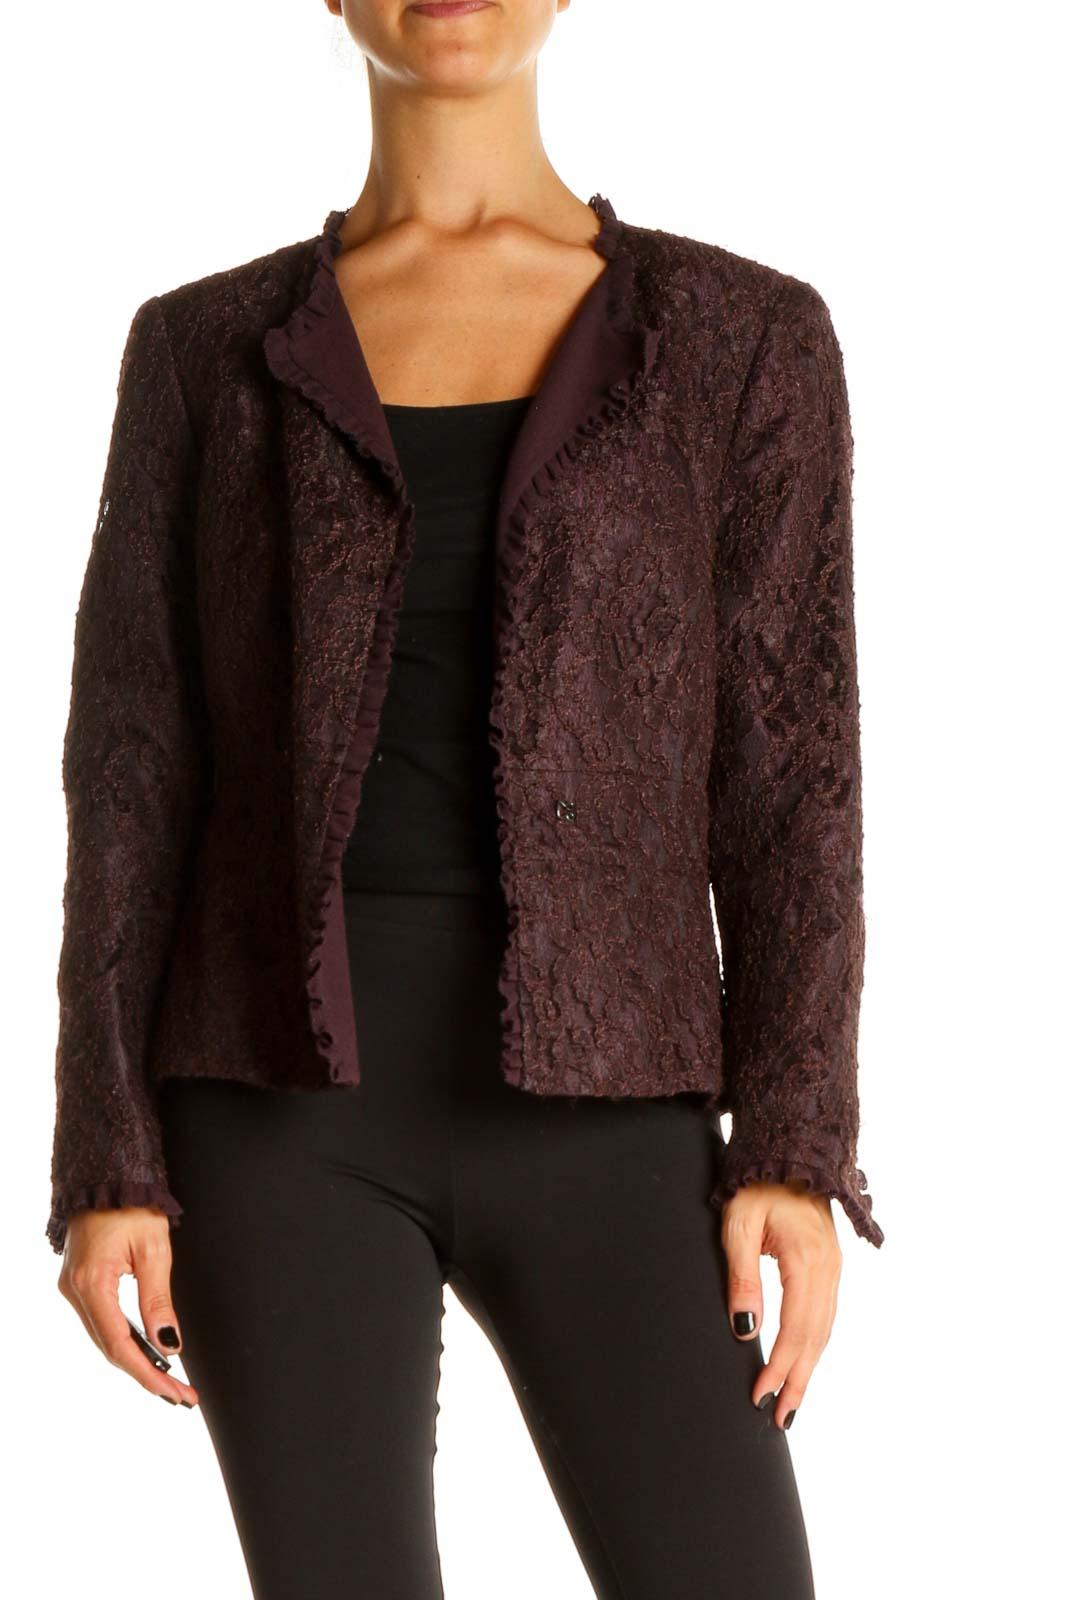 Purple Jacket Front